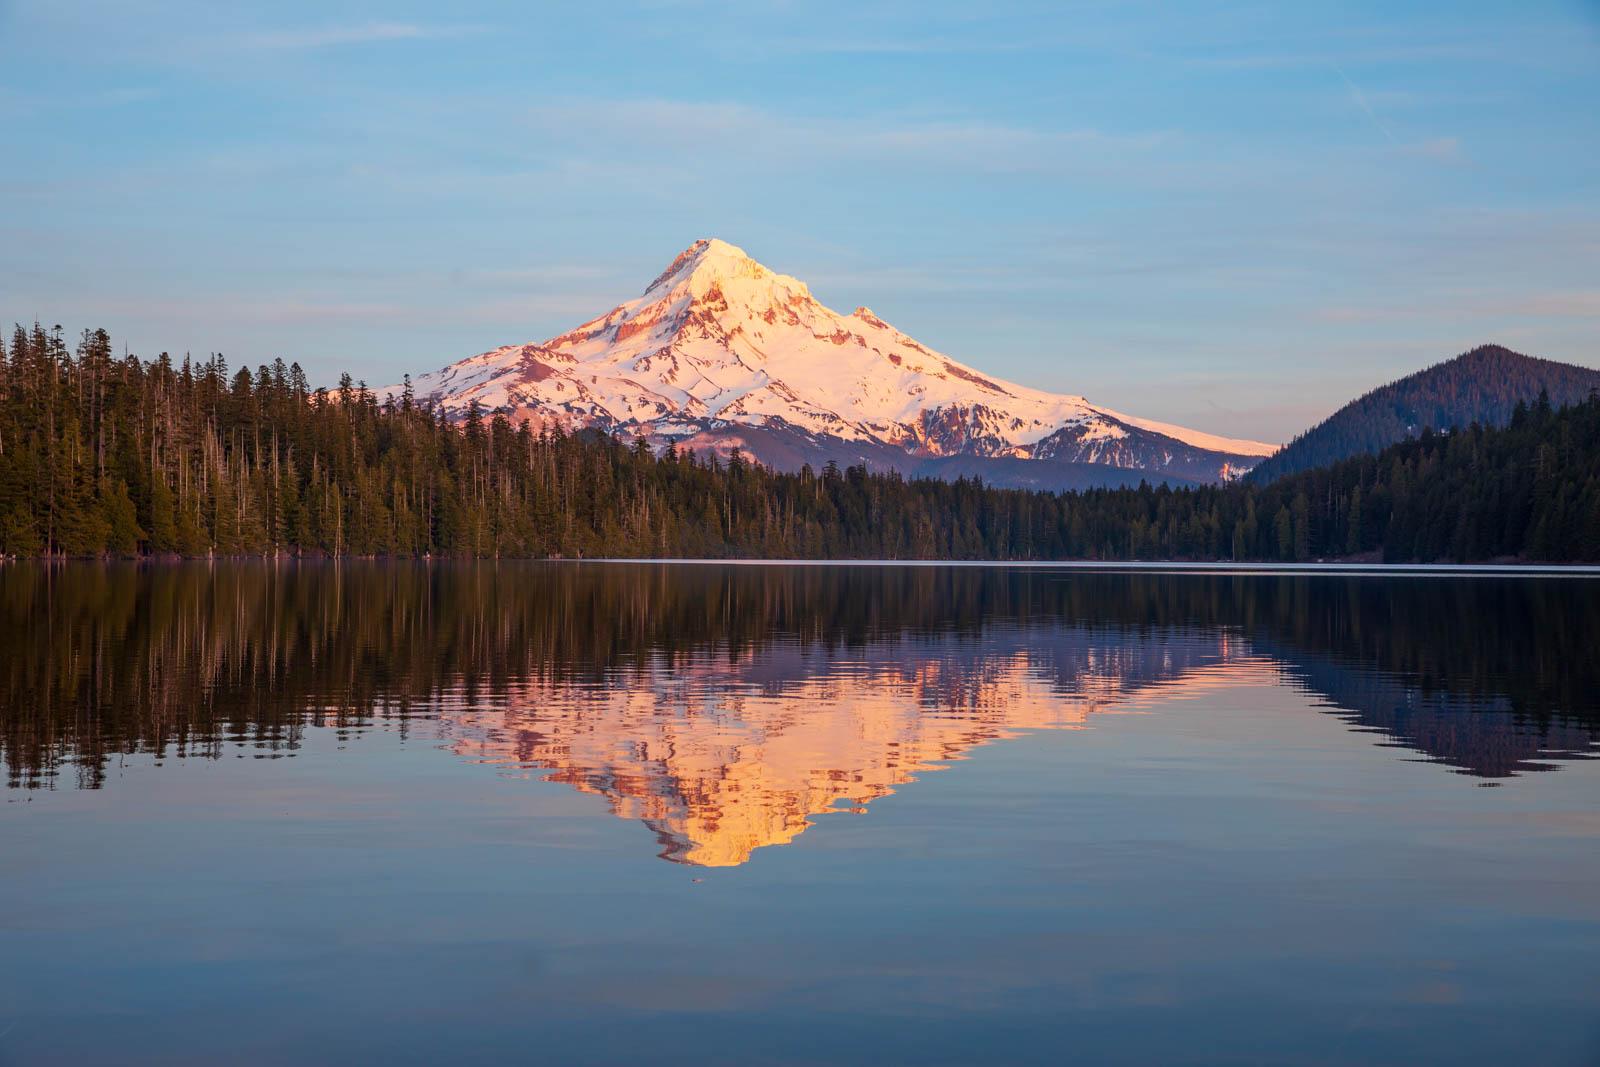 Lost Lake und Mt. Hood, Sonnenuntergang